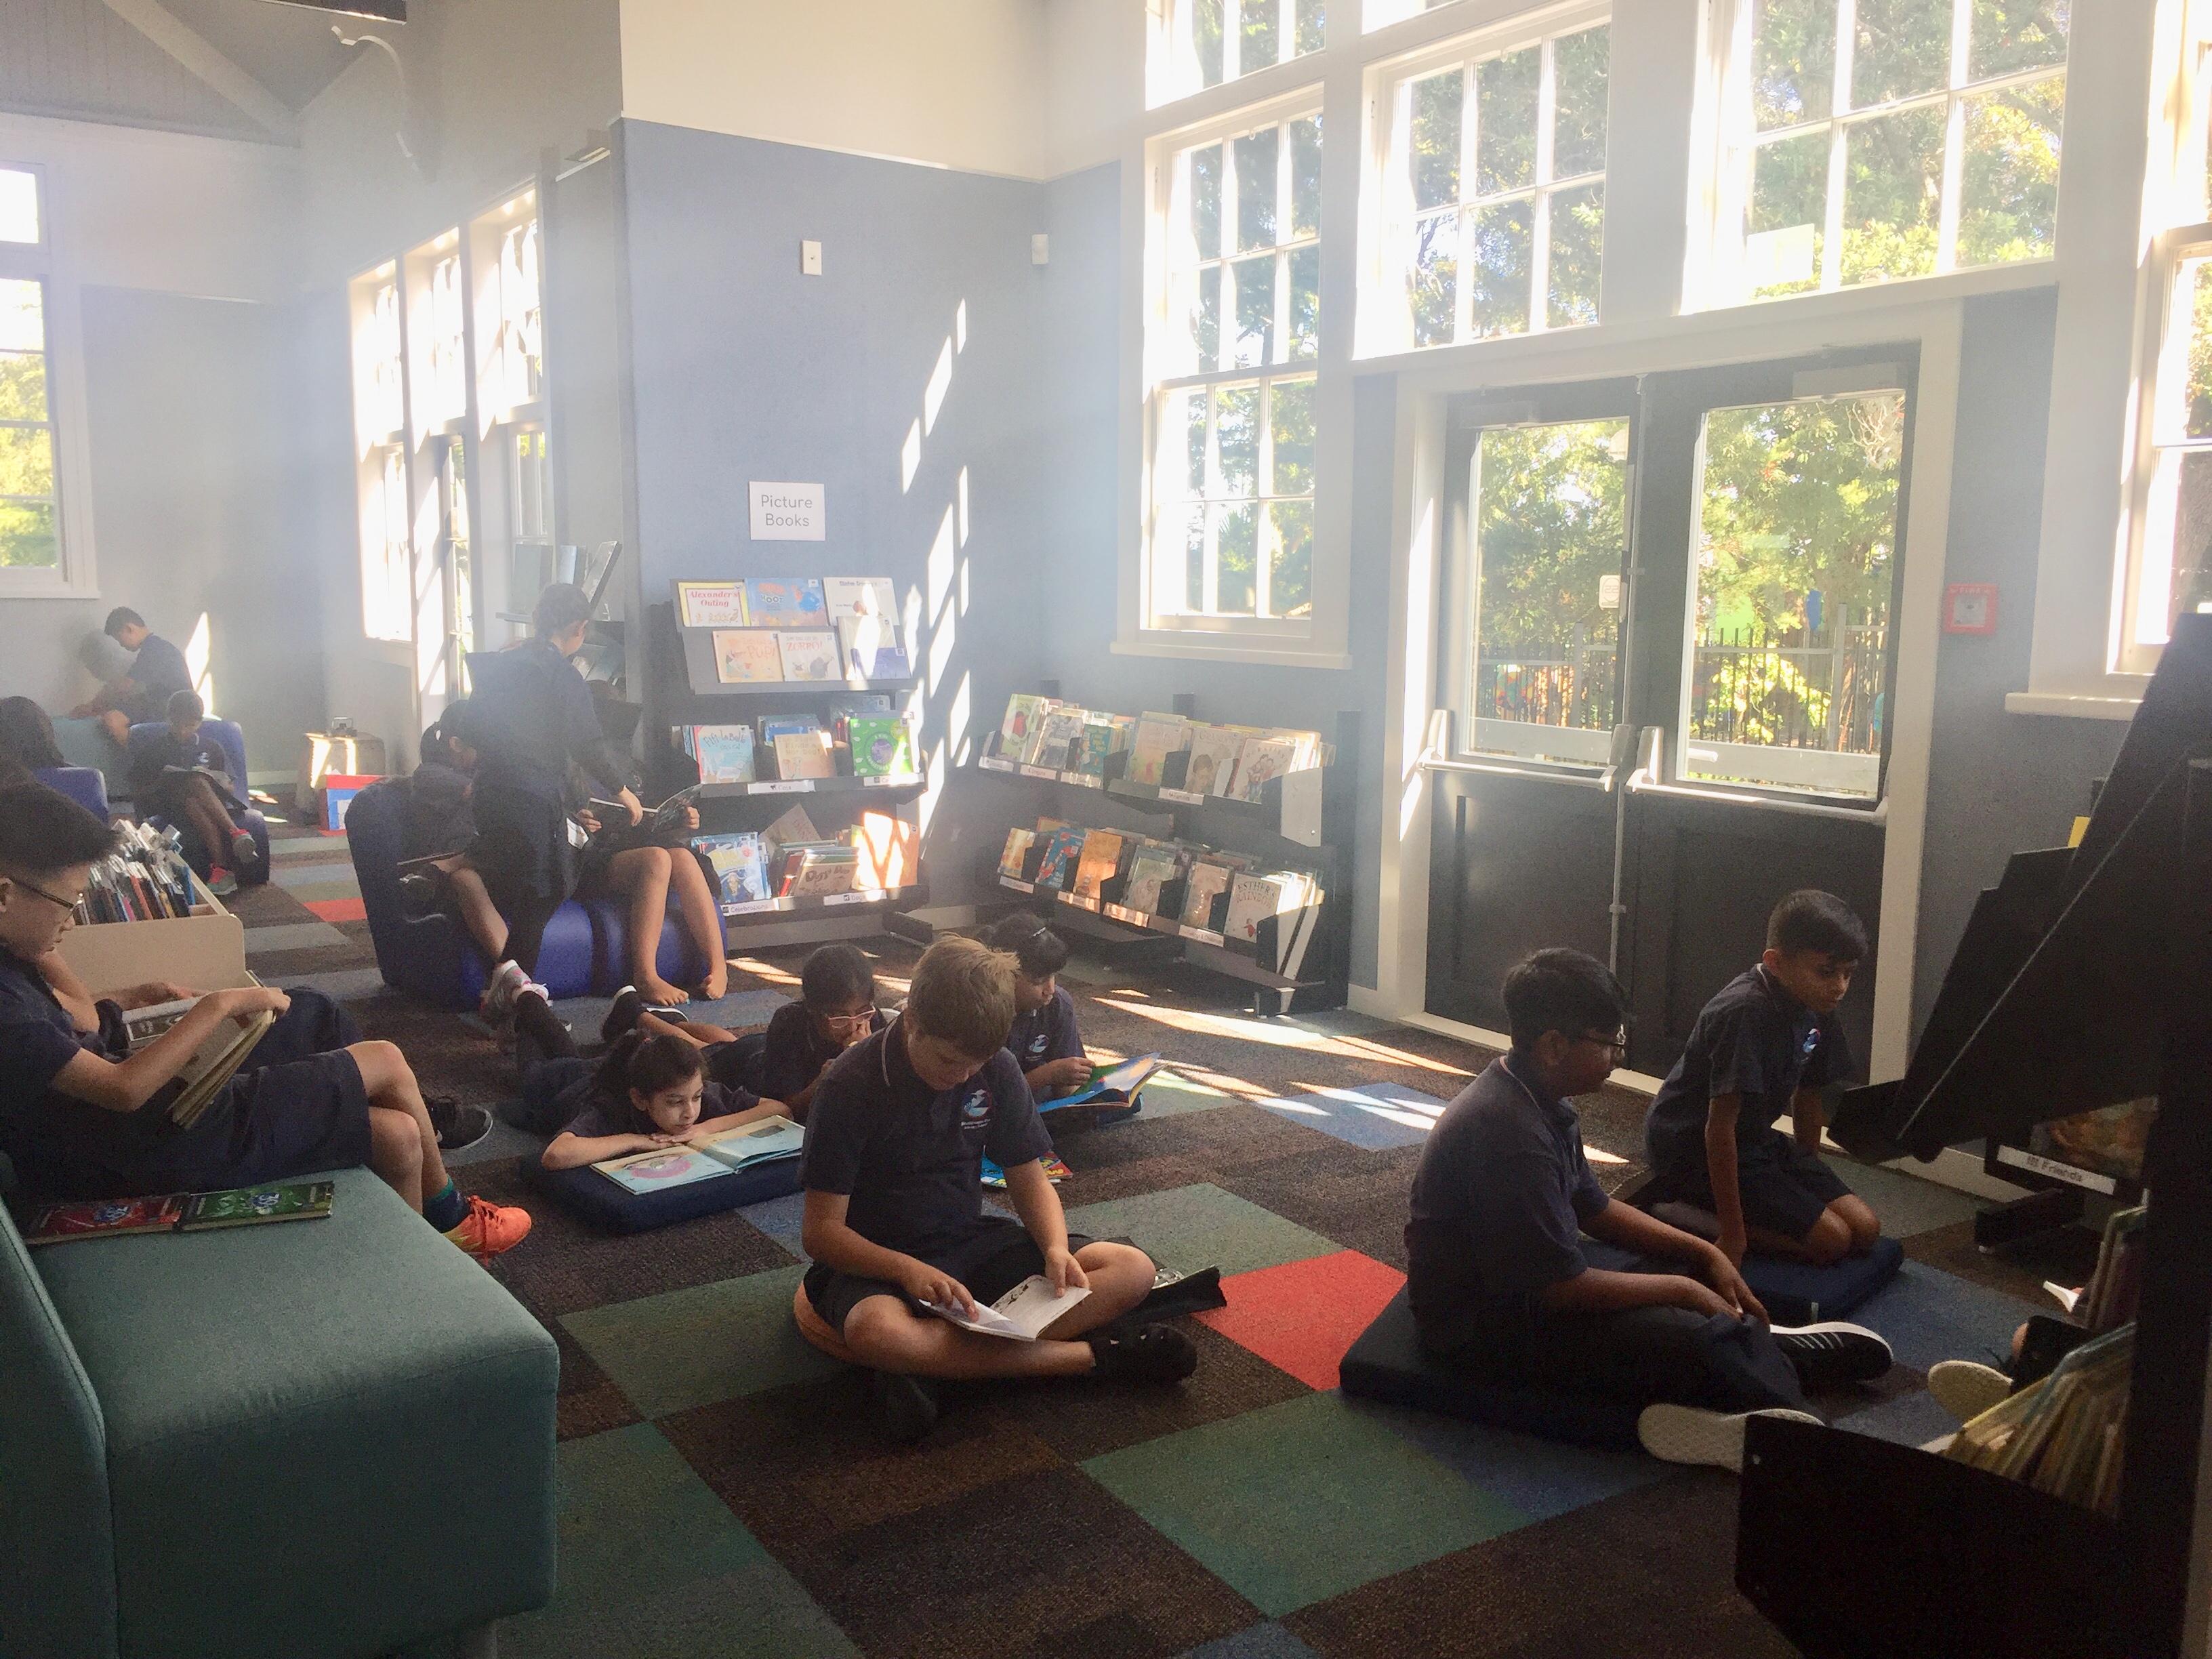 Blockhouse Bay Primary School - Whanau Kotahi in Te Manawa